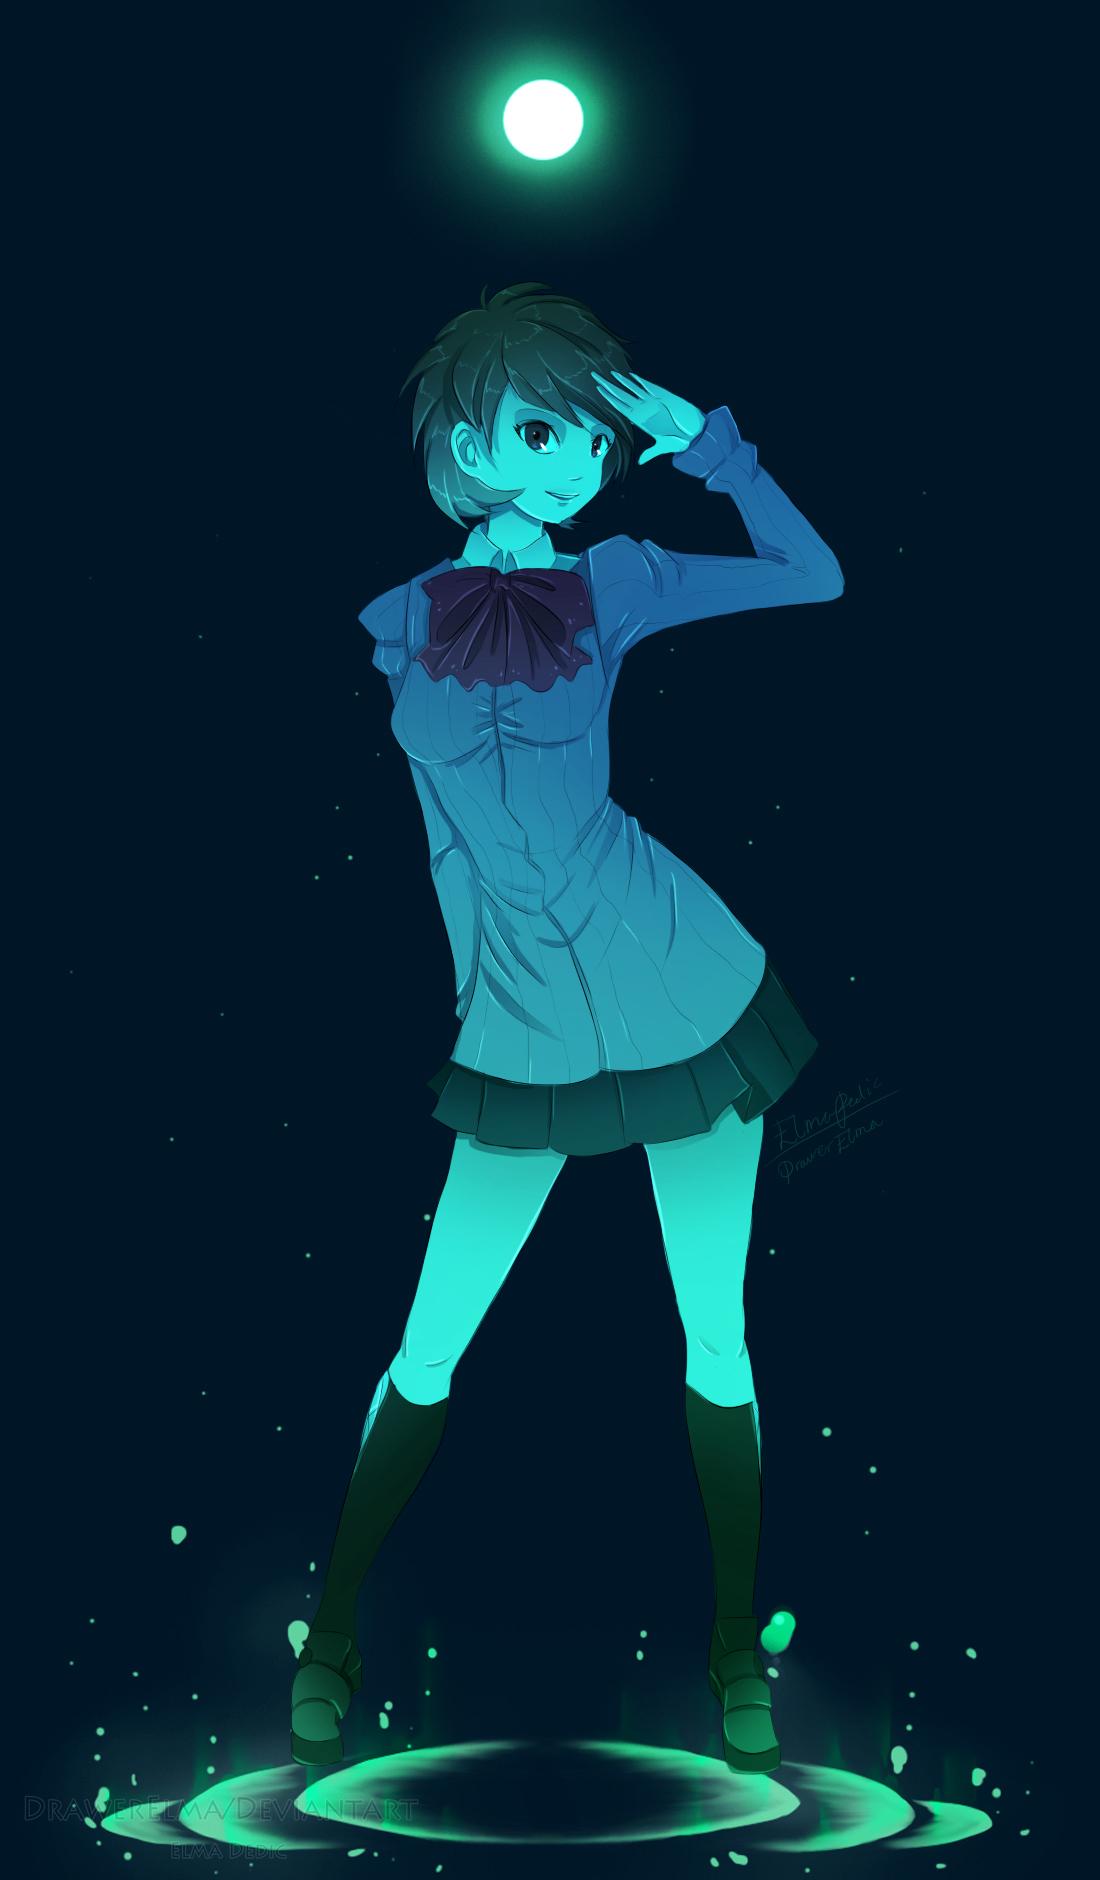 Persona 3 FES - Yukari Takeba by NemiruTami